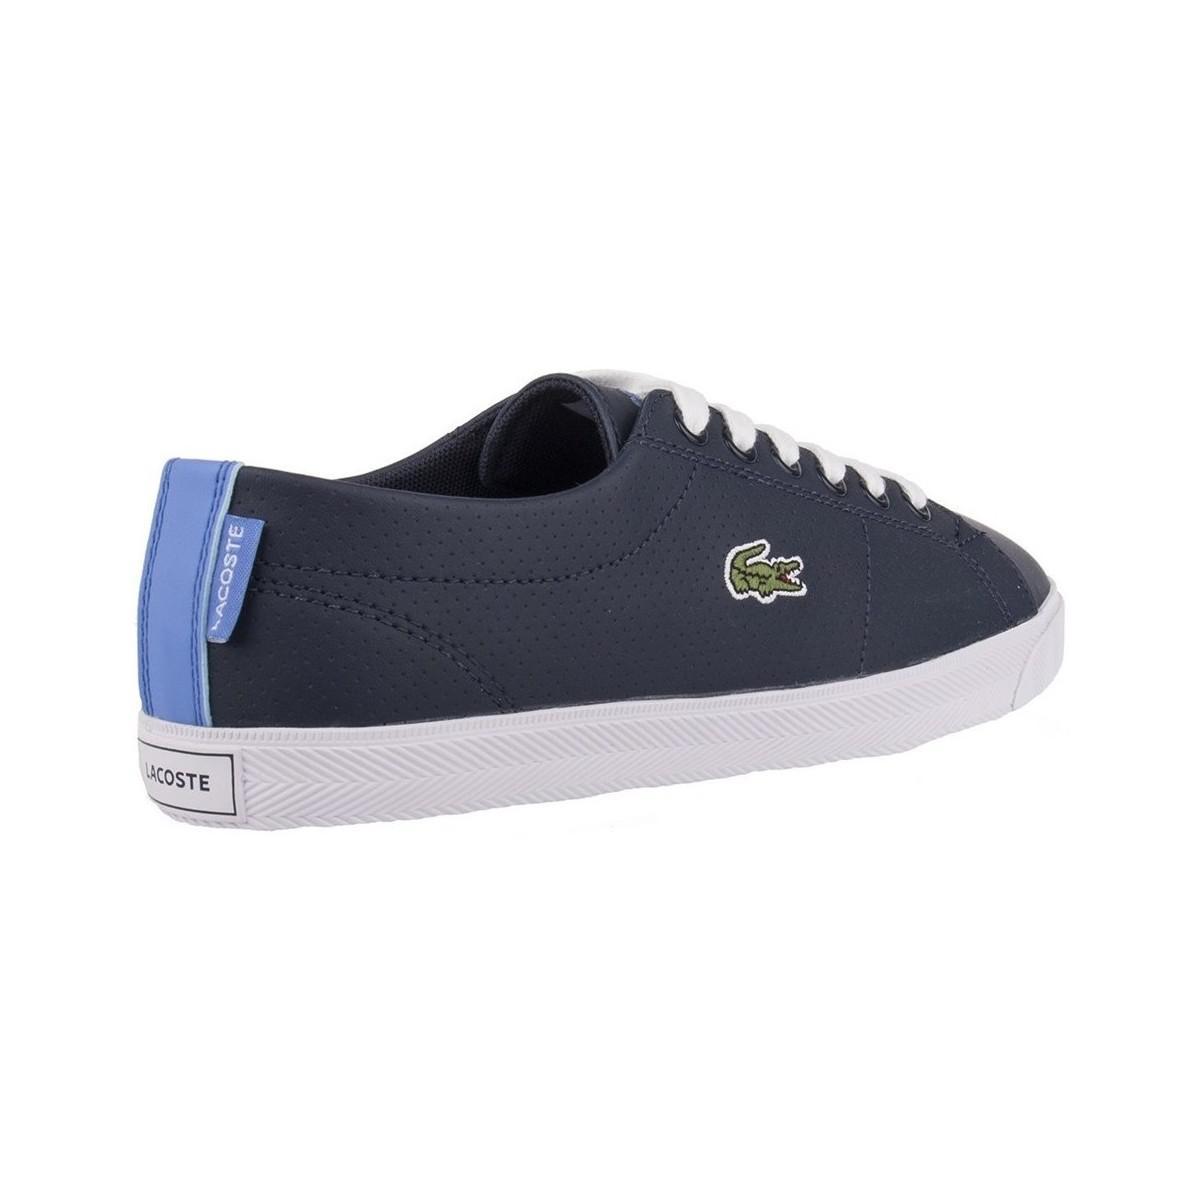 Lowest Price Online Lacoste 731SPJ0014NV1 women's Shoes (Trainers) in 2018 New Online hZkwnBxeQr